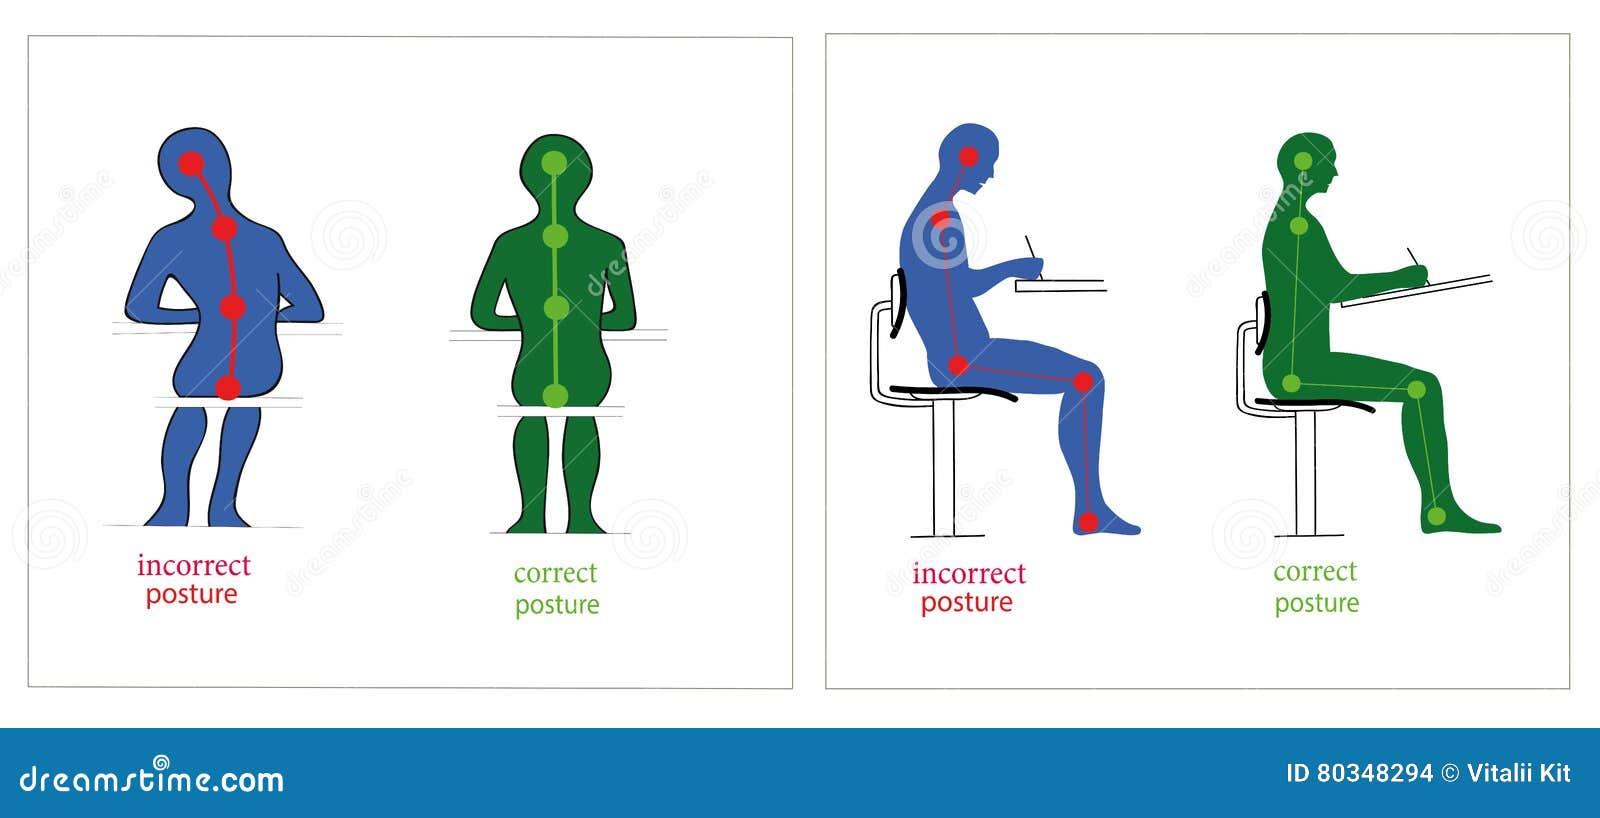 Improve Posture While Sitting At Desk